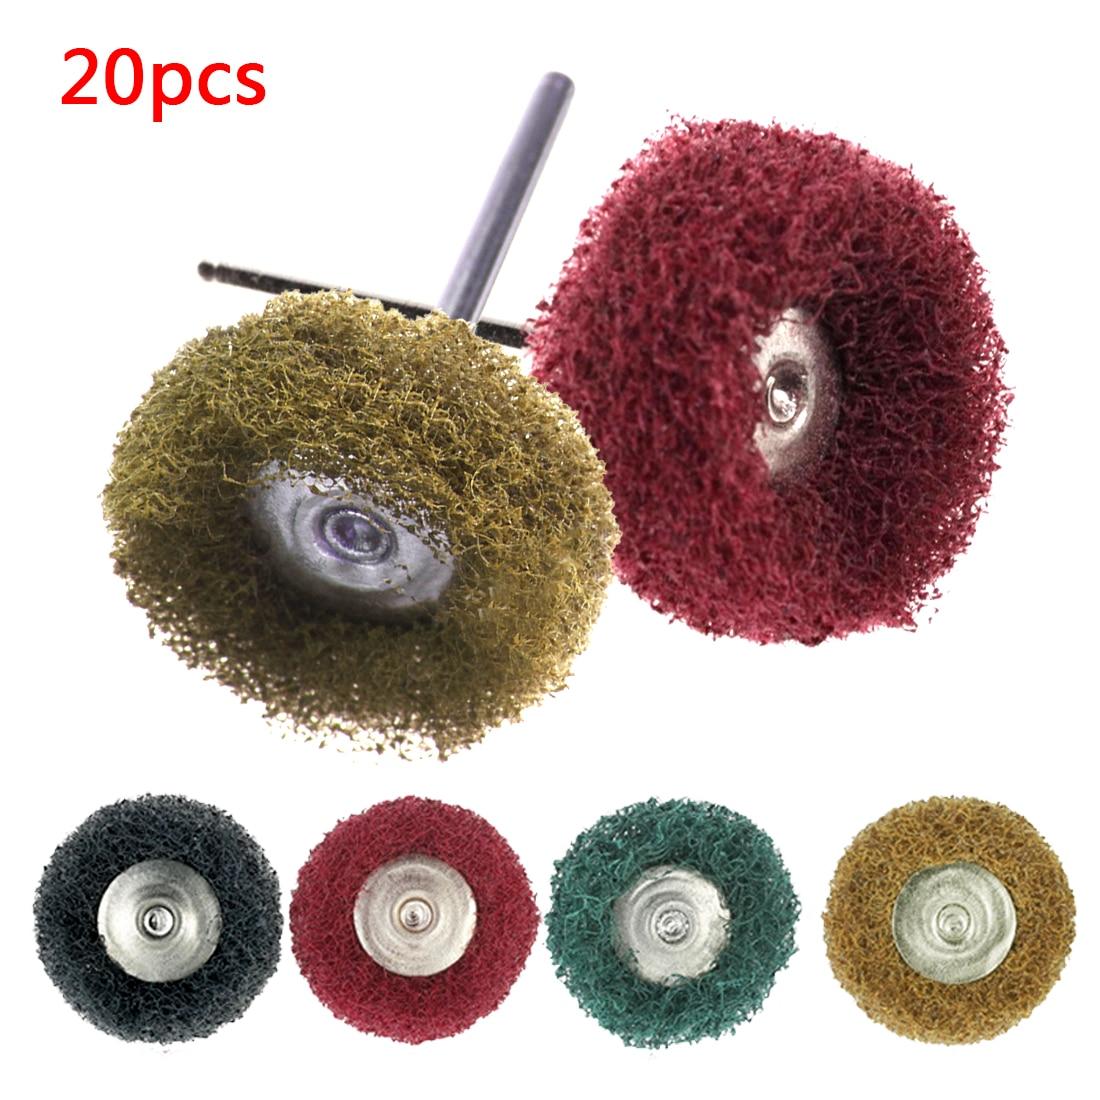 Hot 20pcs Buffing Pad Brush Polishing Wheel Jewelry Micro-Electronic Dremel Accessories For Rotary Tools Nylon Polishing Pads